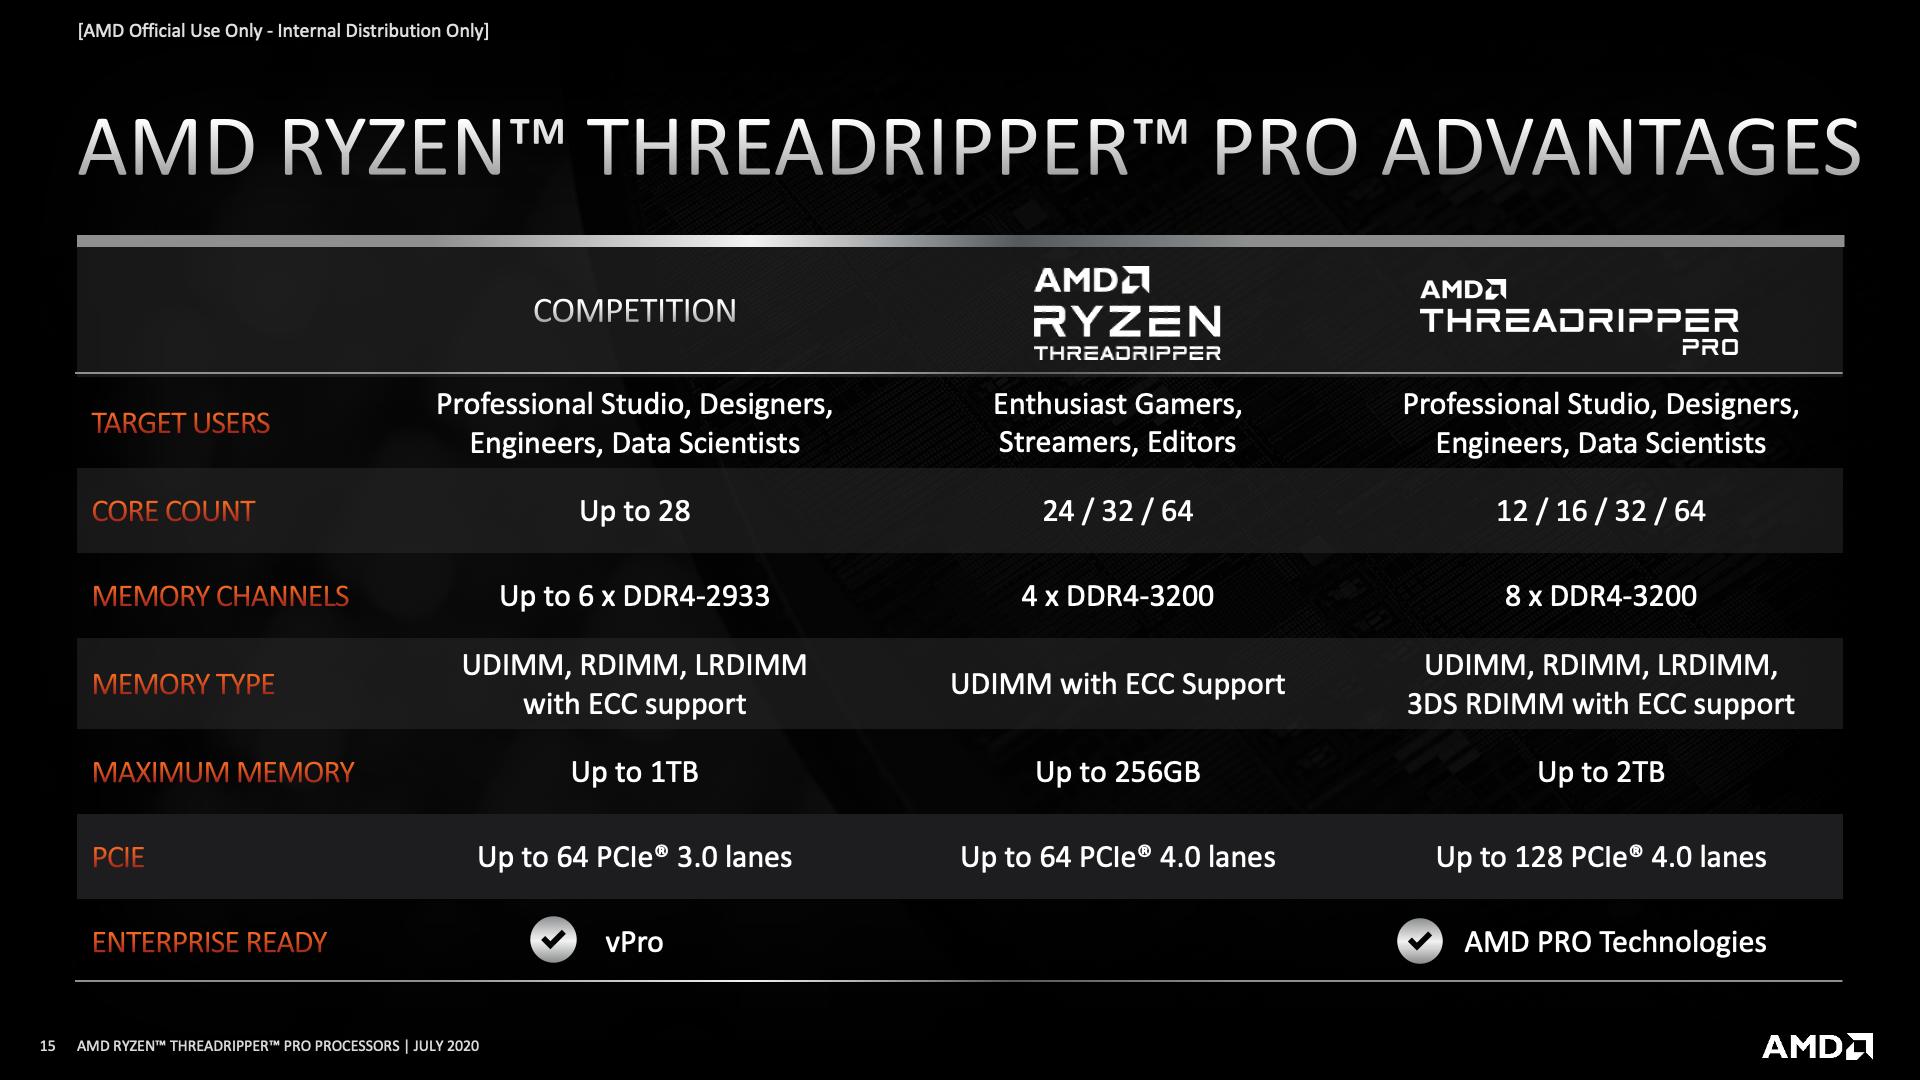 Threadripper Pro AMD Ryzen advantages